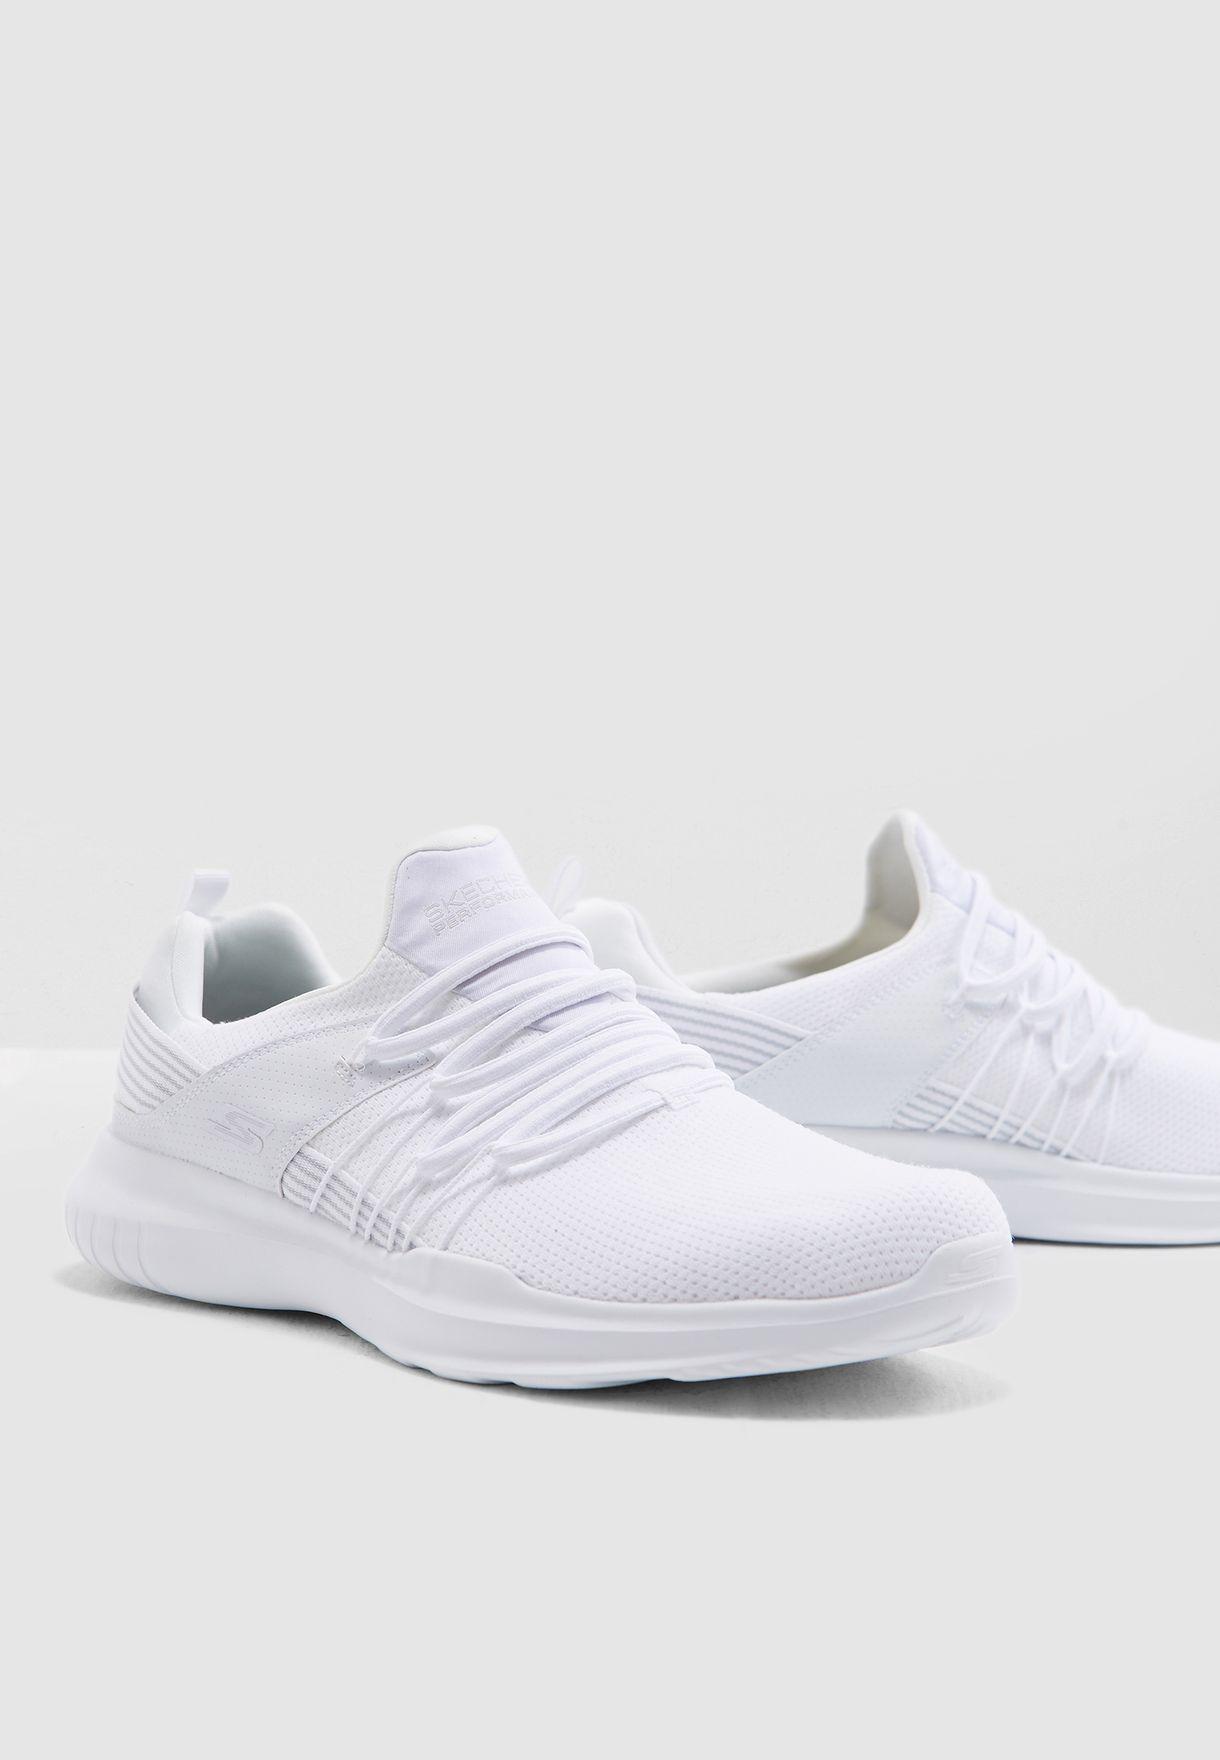 7dec106d07455 تسوق حذاء جو رن موجو ماركة سكيتشرز لون أبيض 54843-WHT في السعودية ...